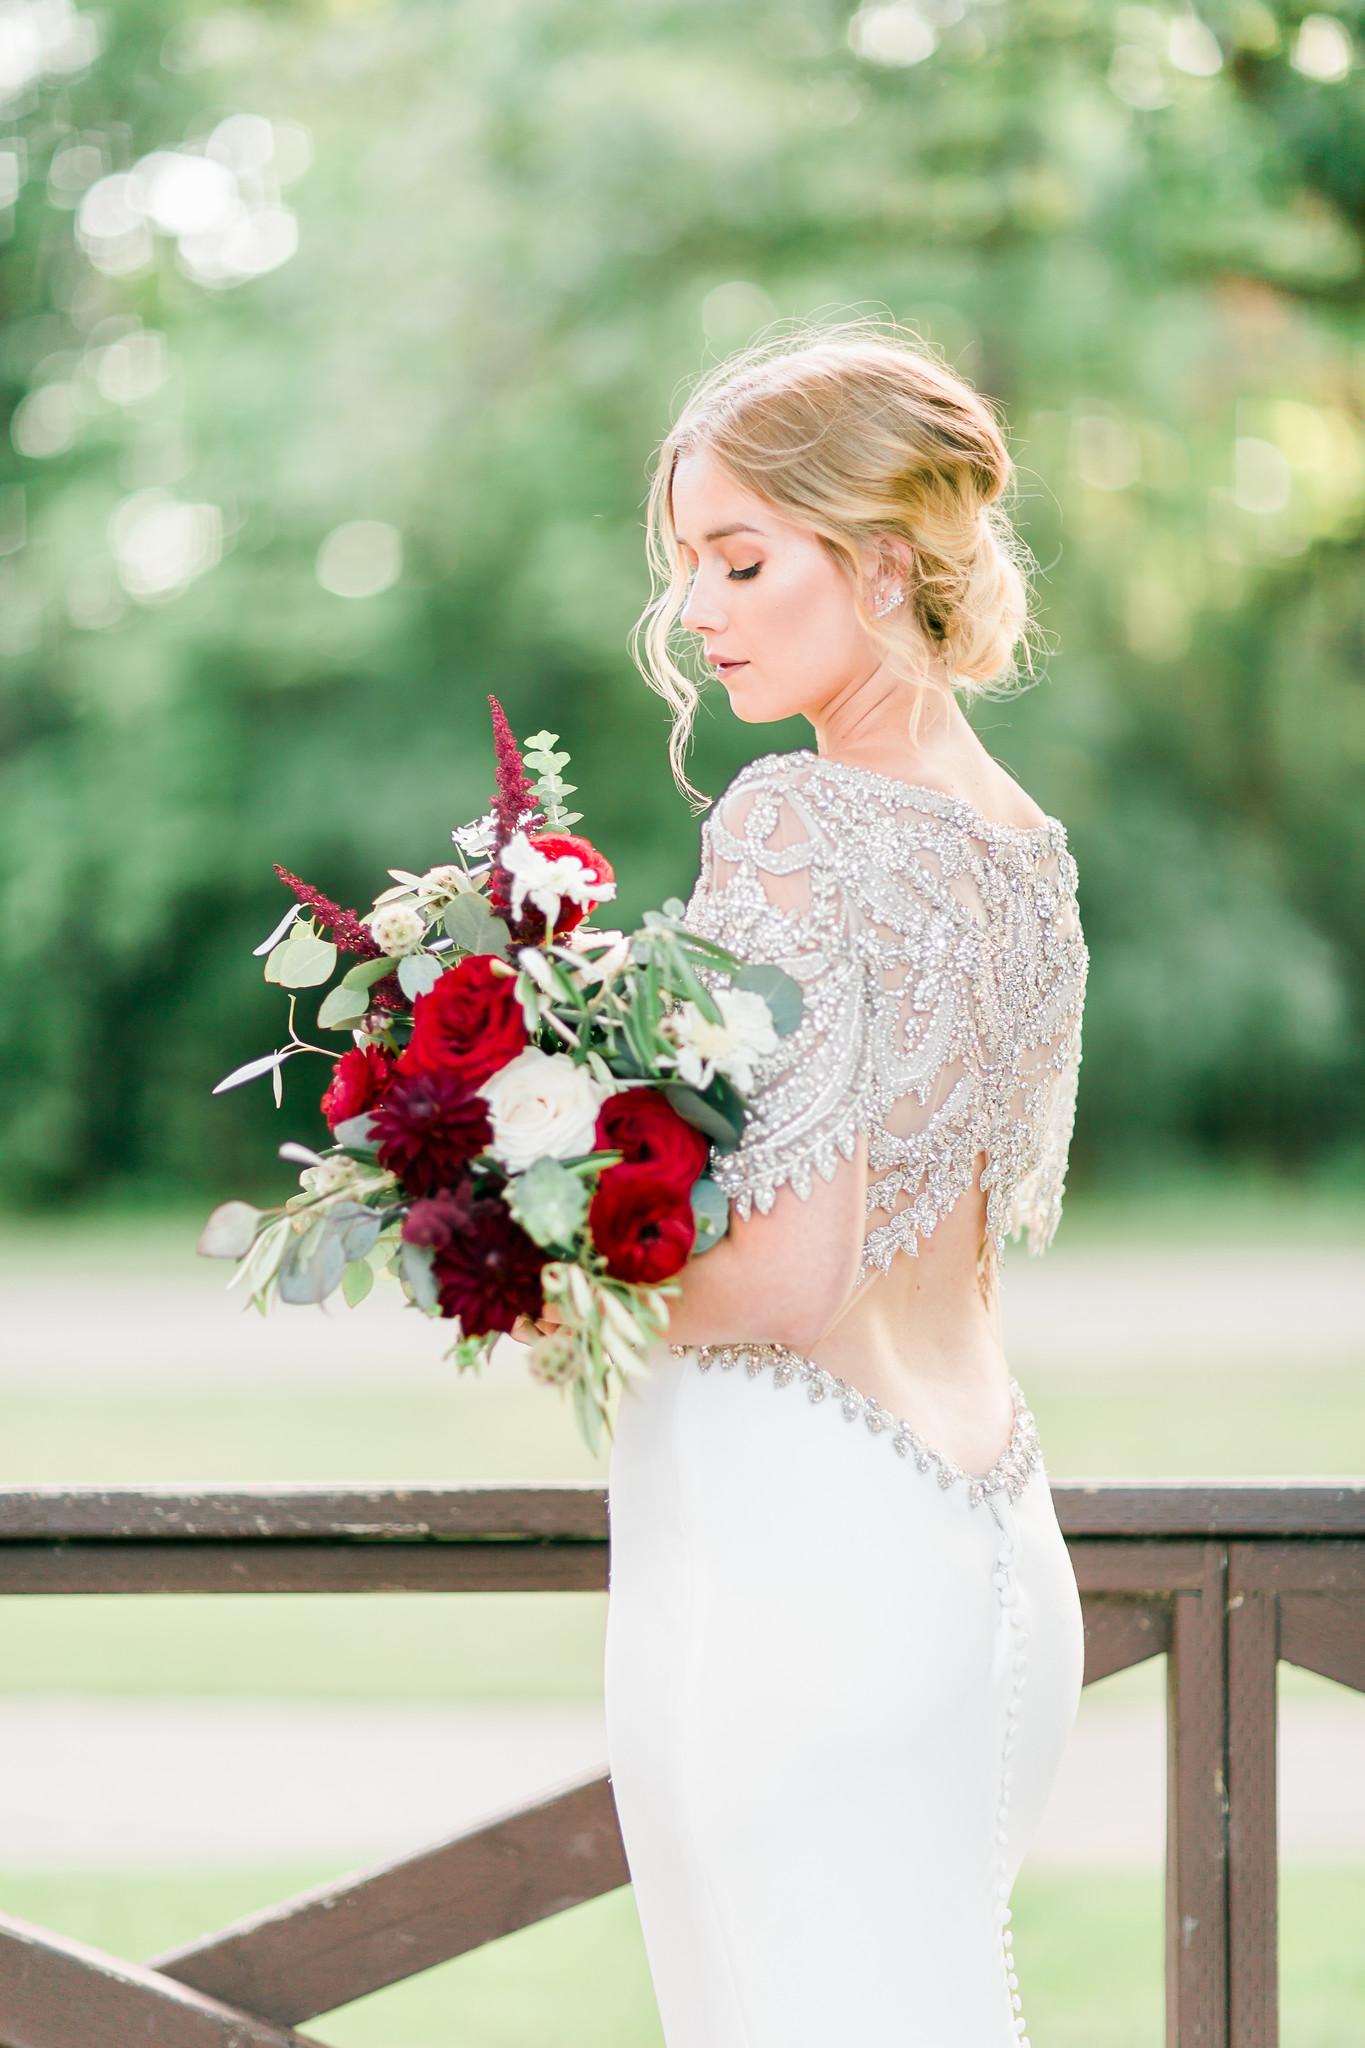 Hair by Courtney Krzysztofik - Makeup by Kiera Memka - Florald by Floral Fixx - Dress from Bliss Bridal Boutique - Photo by Charmaine Mallari